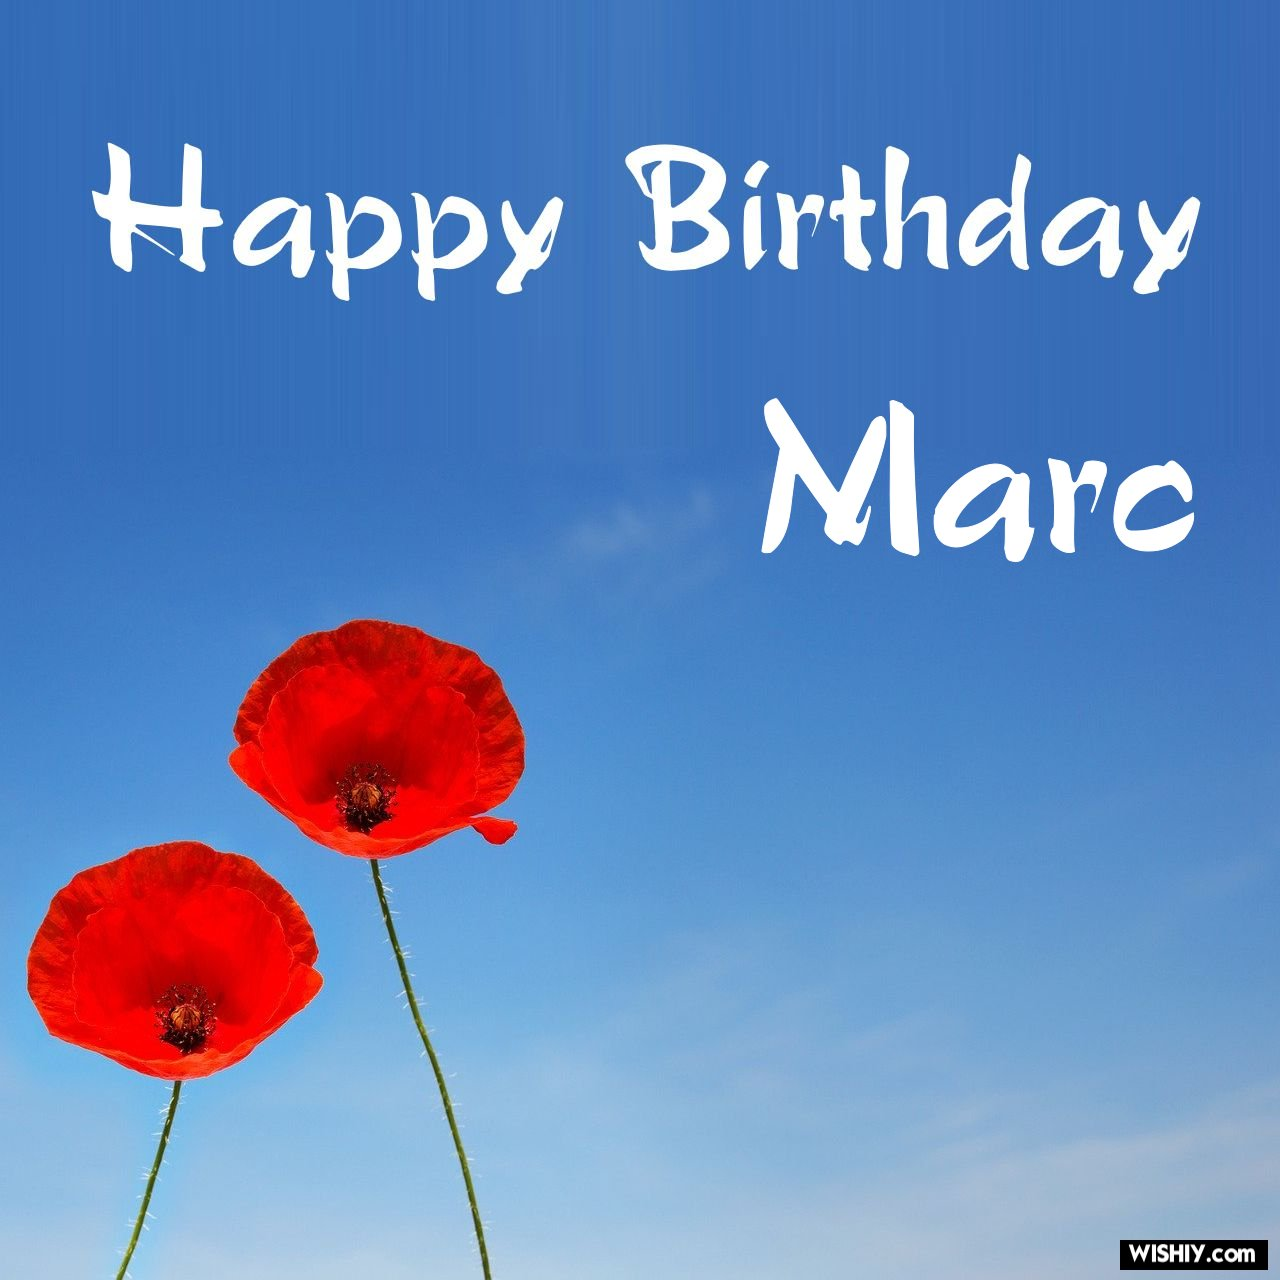 50 Best Geburtstag Bilder Fur Marc Sofort Download Wishiy Com